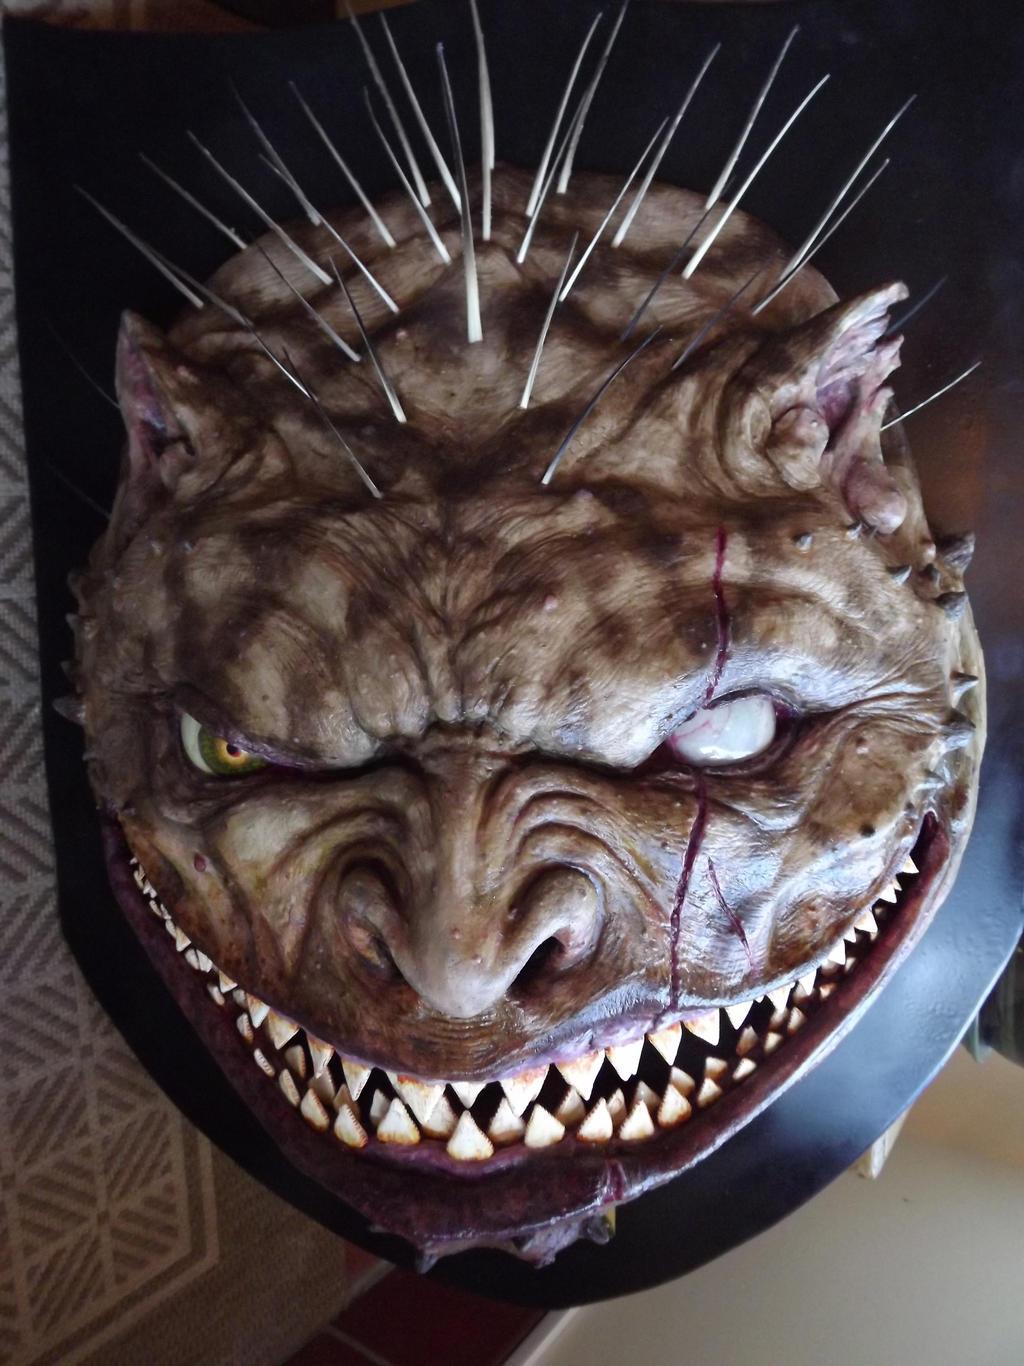 Manticore Trophy Head by Caberwood on DeviantArt